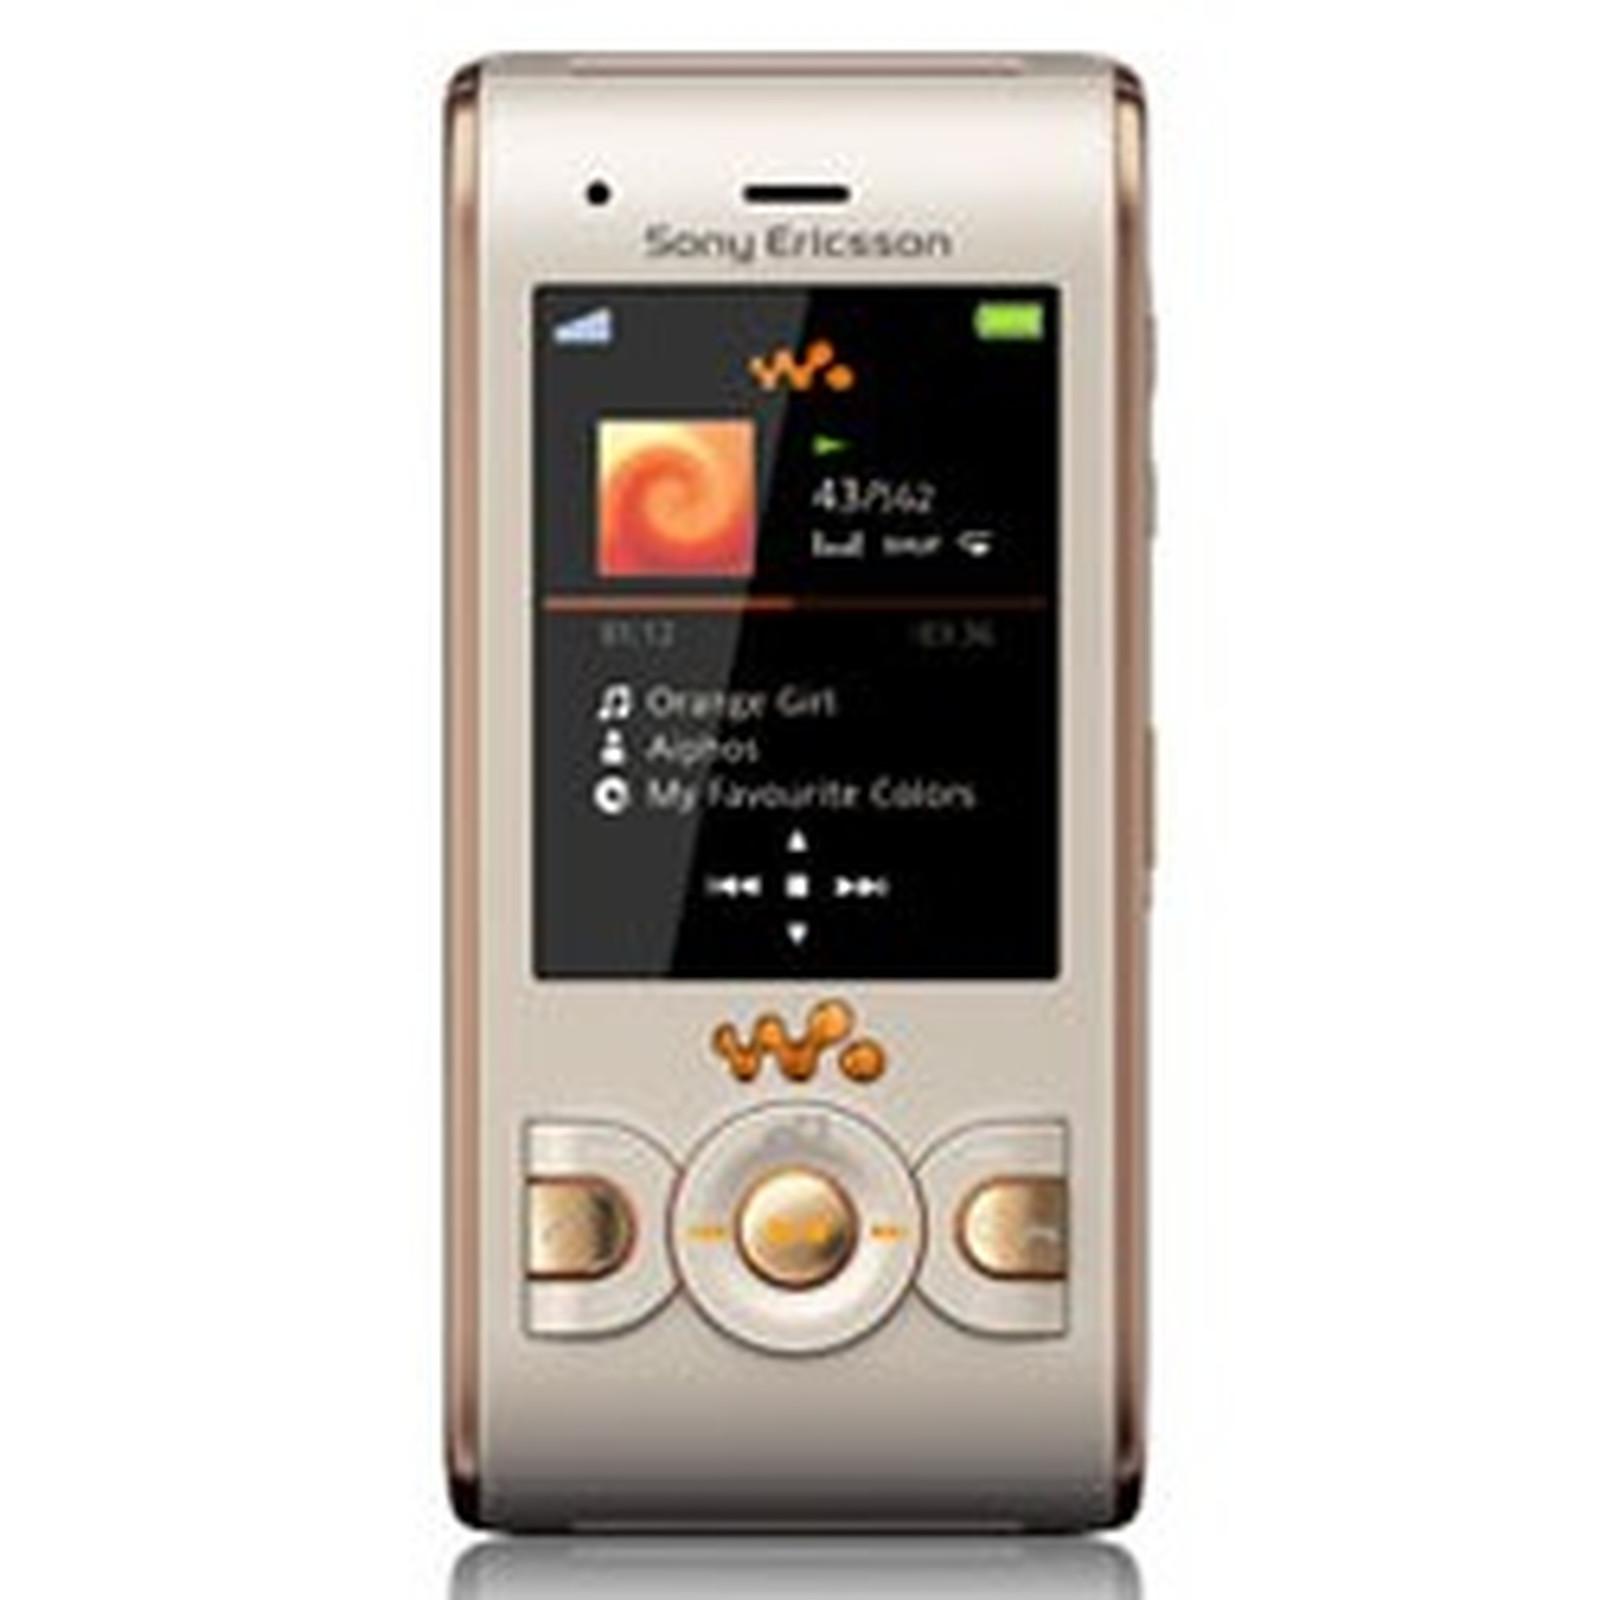 jeux portable sony ericsson w595